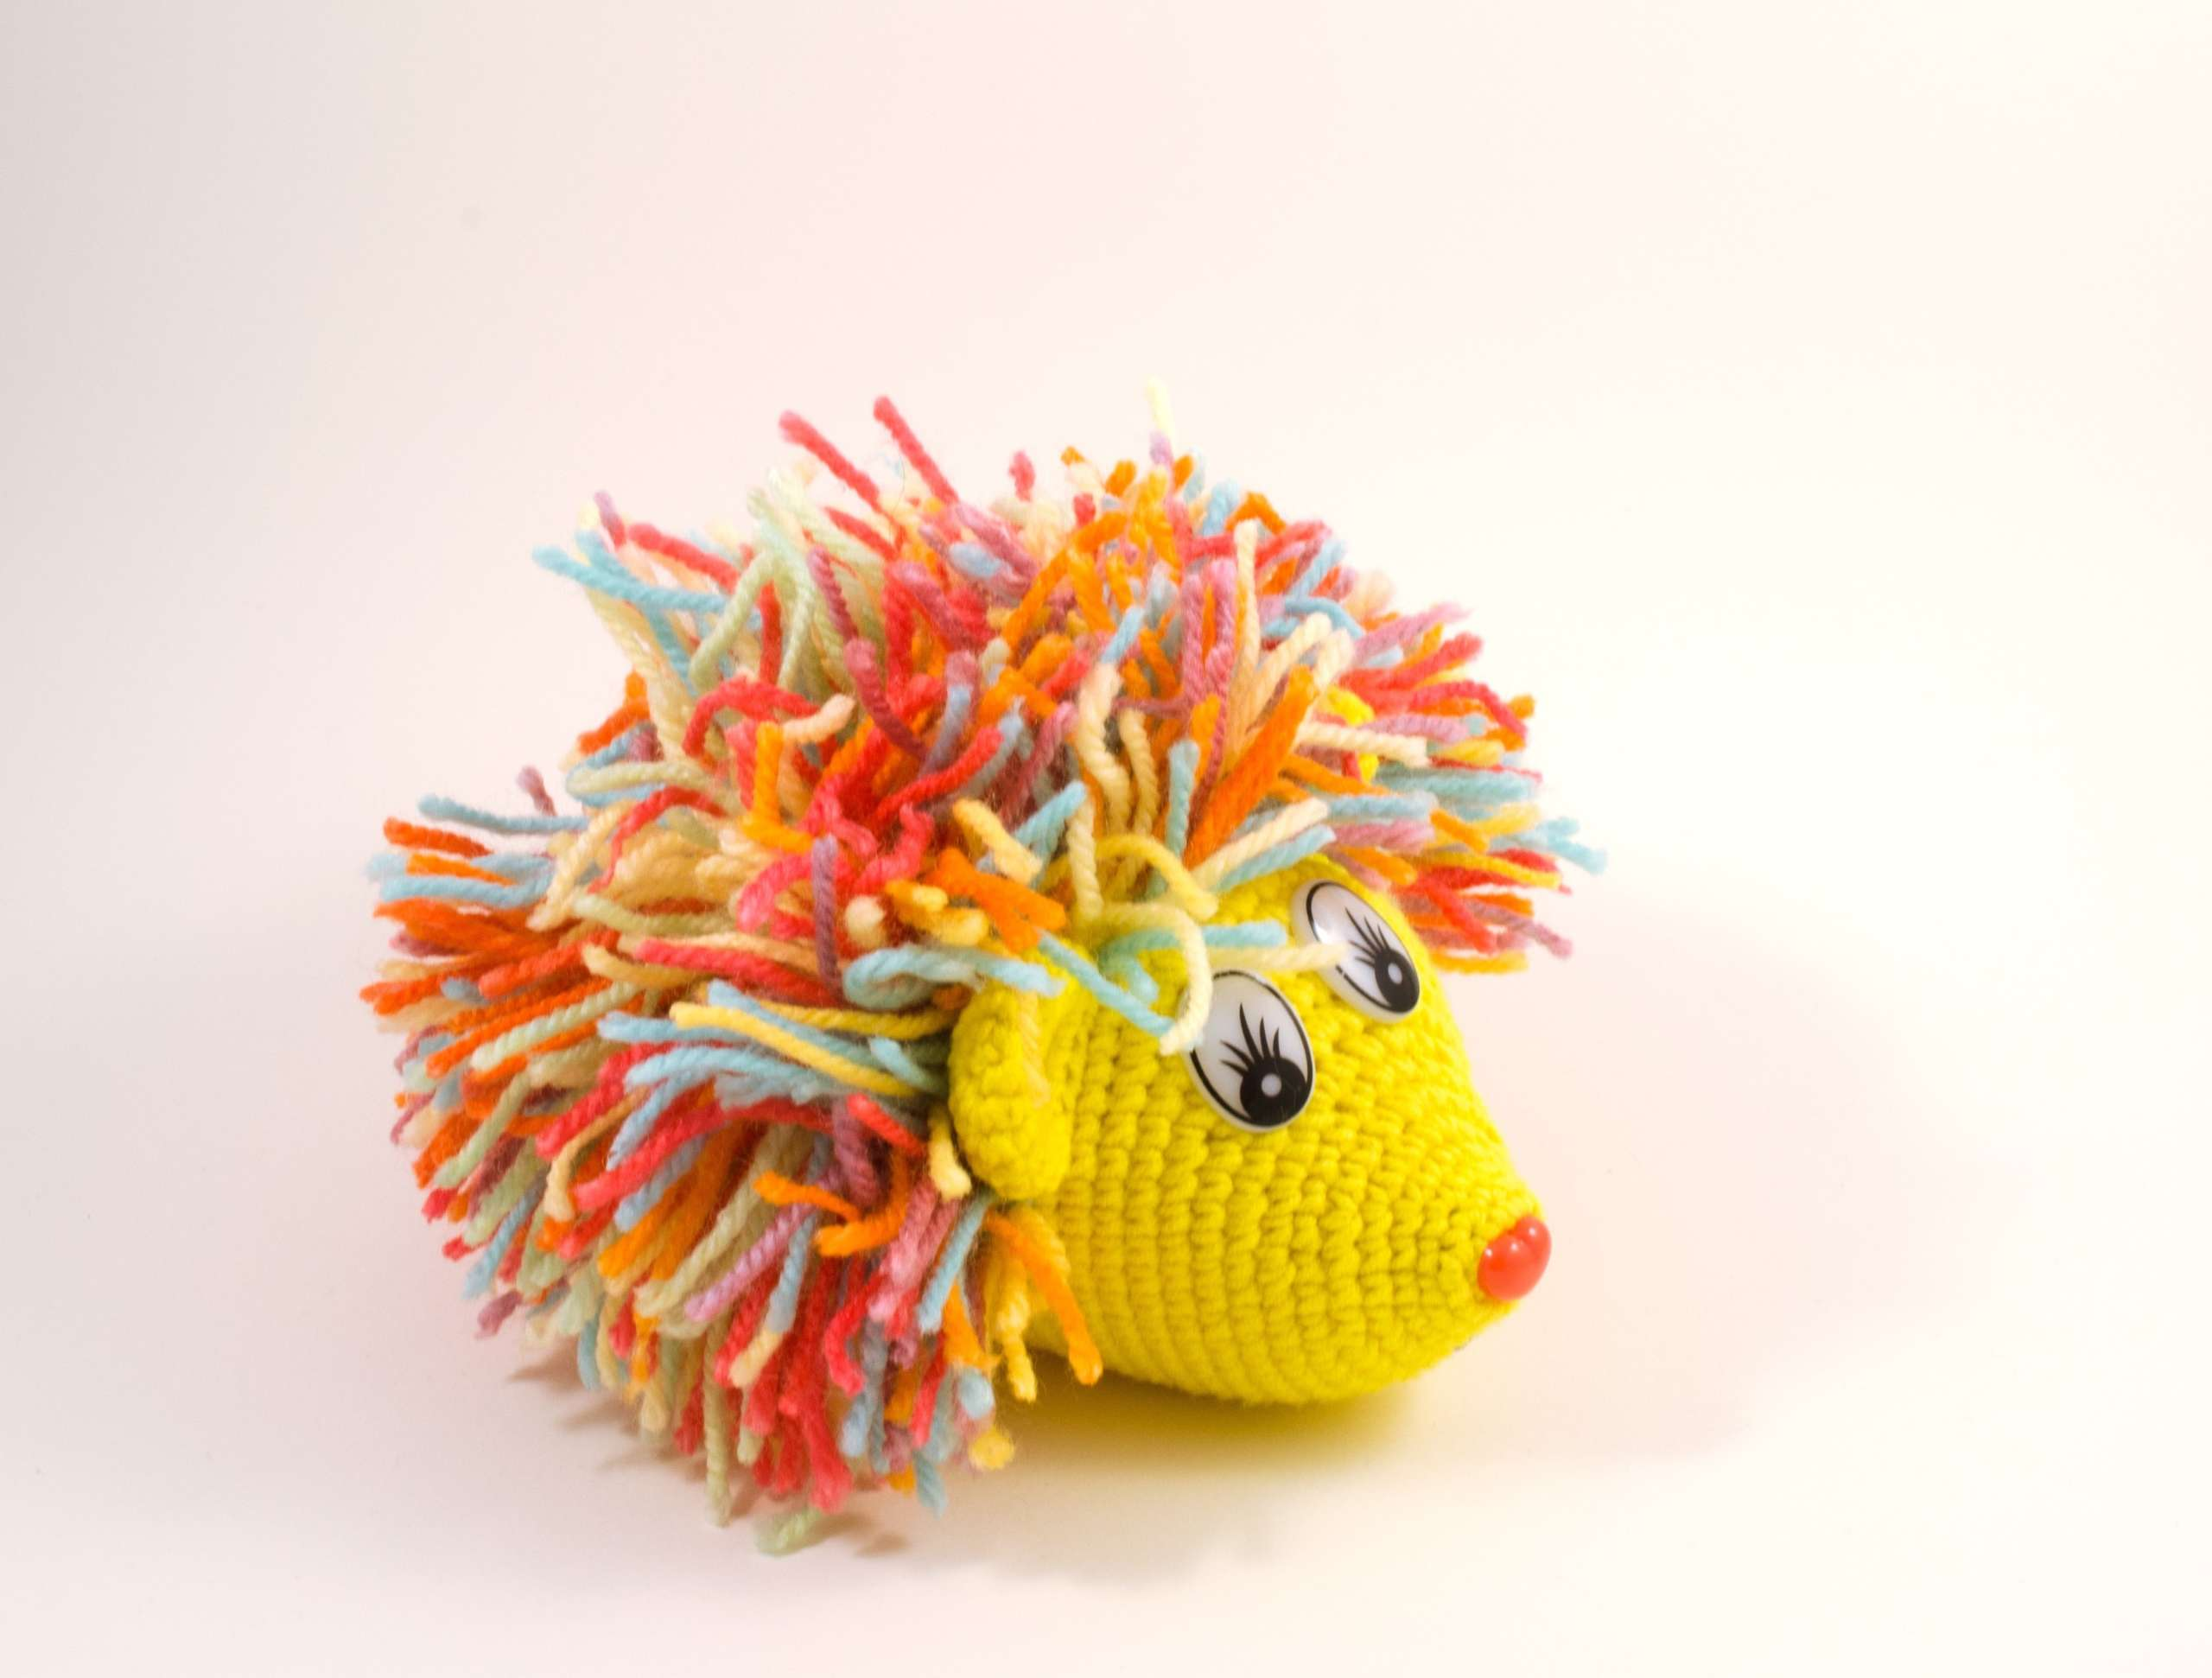 crochet hedgehog side view